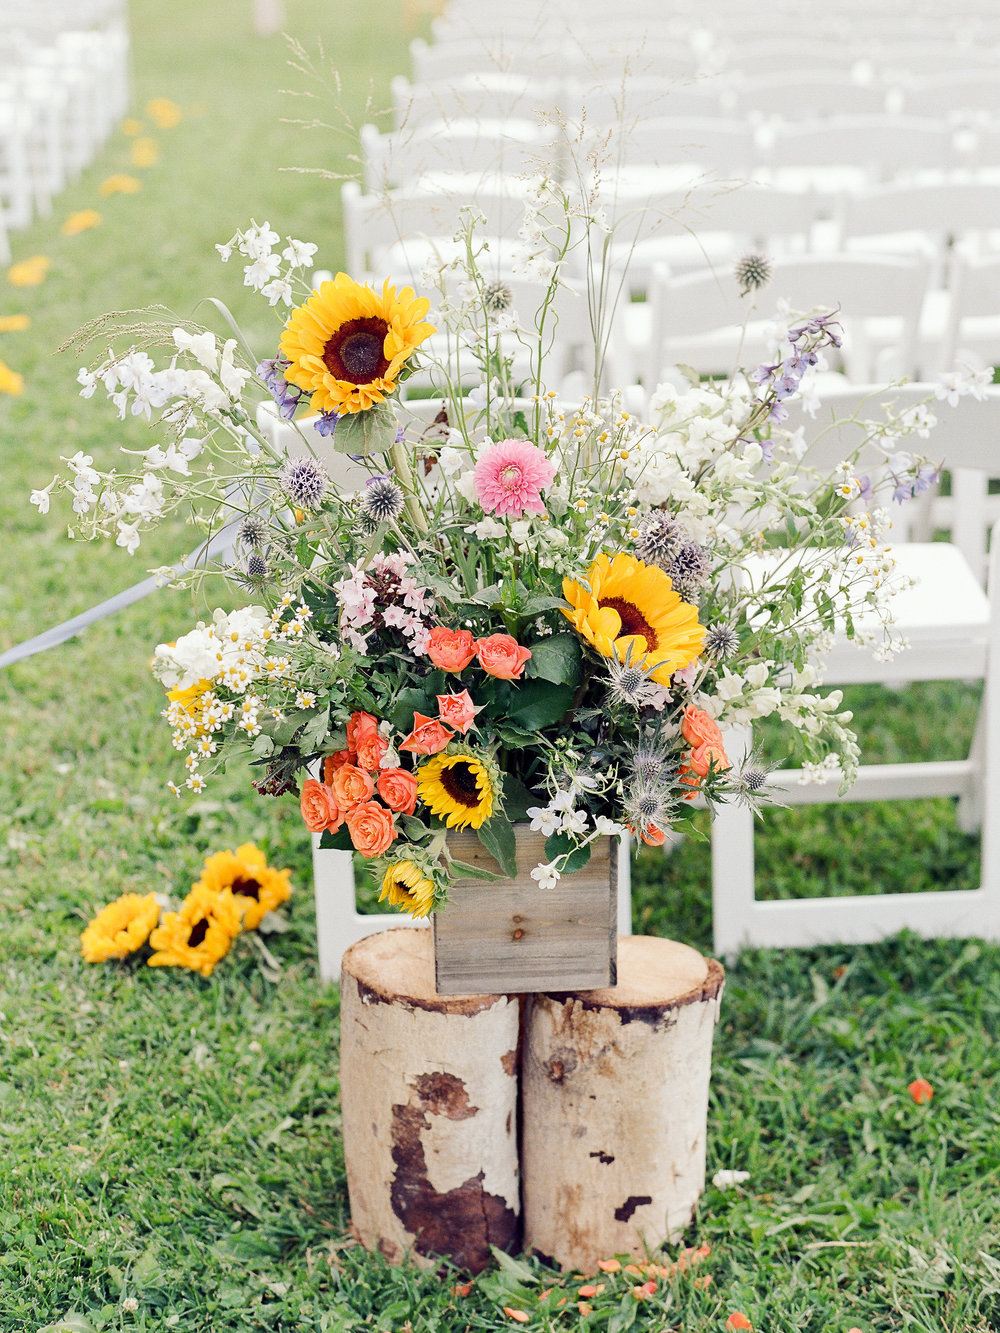 kerry-jon-wedding-345.jpg